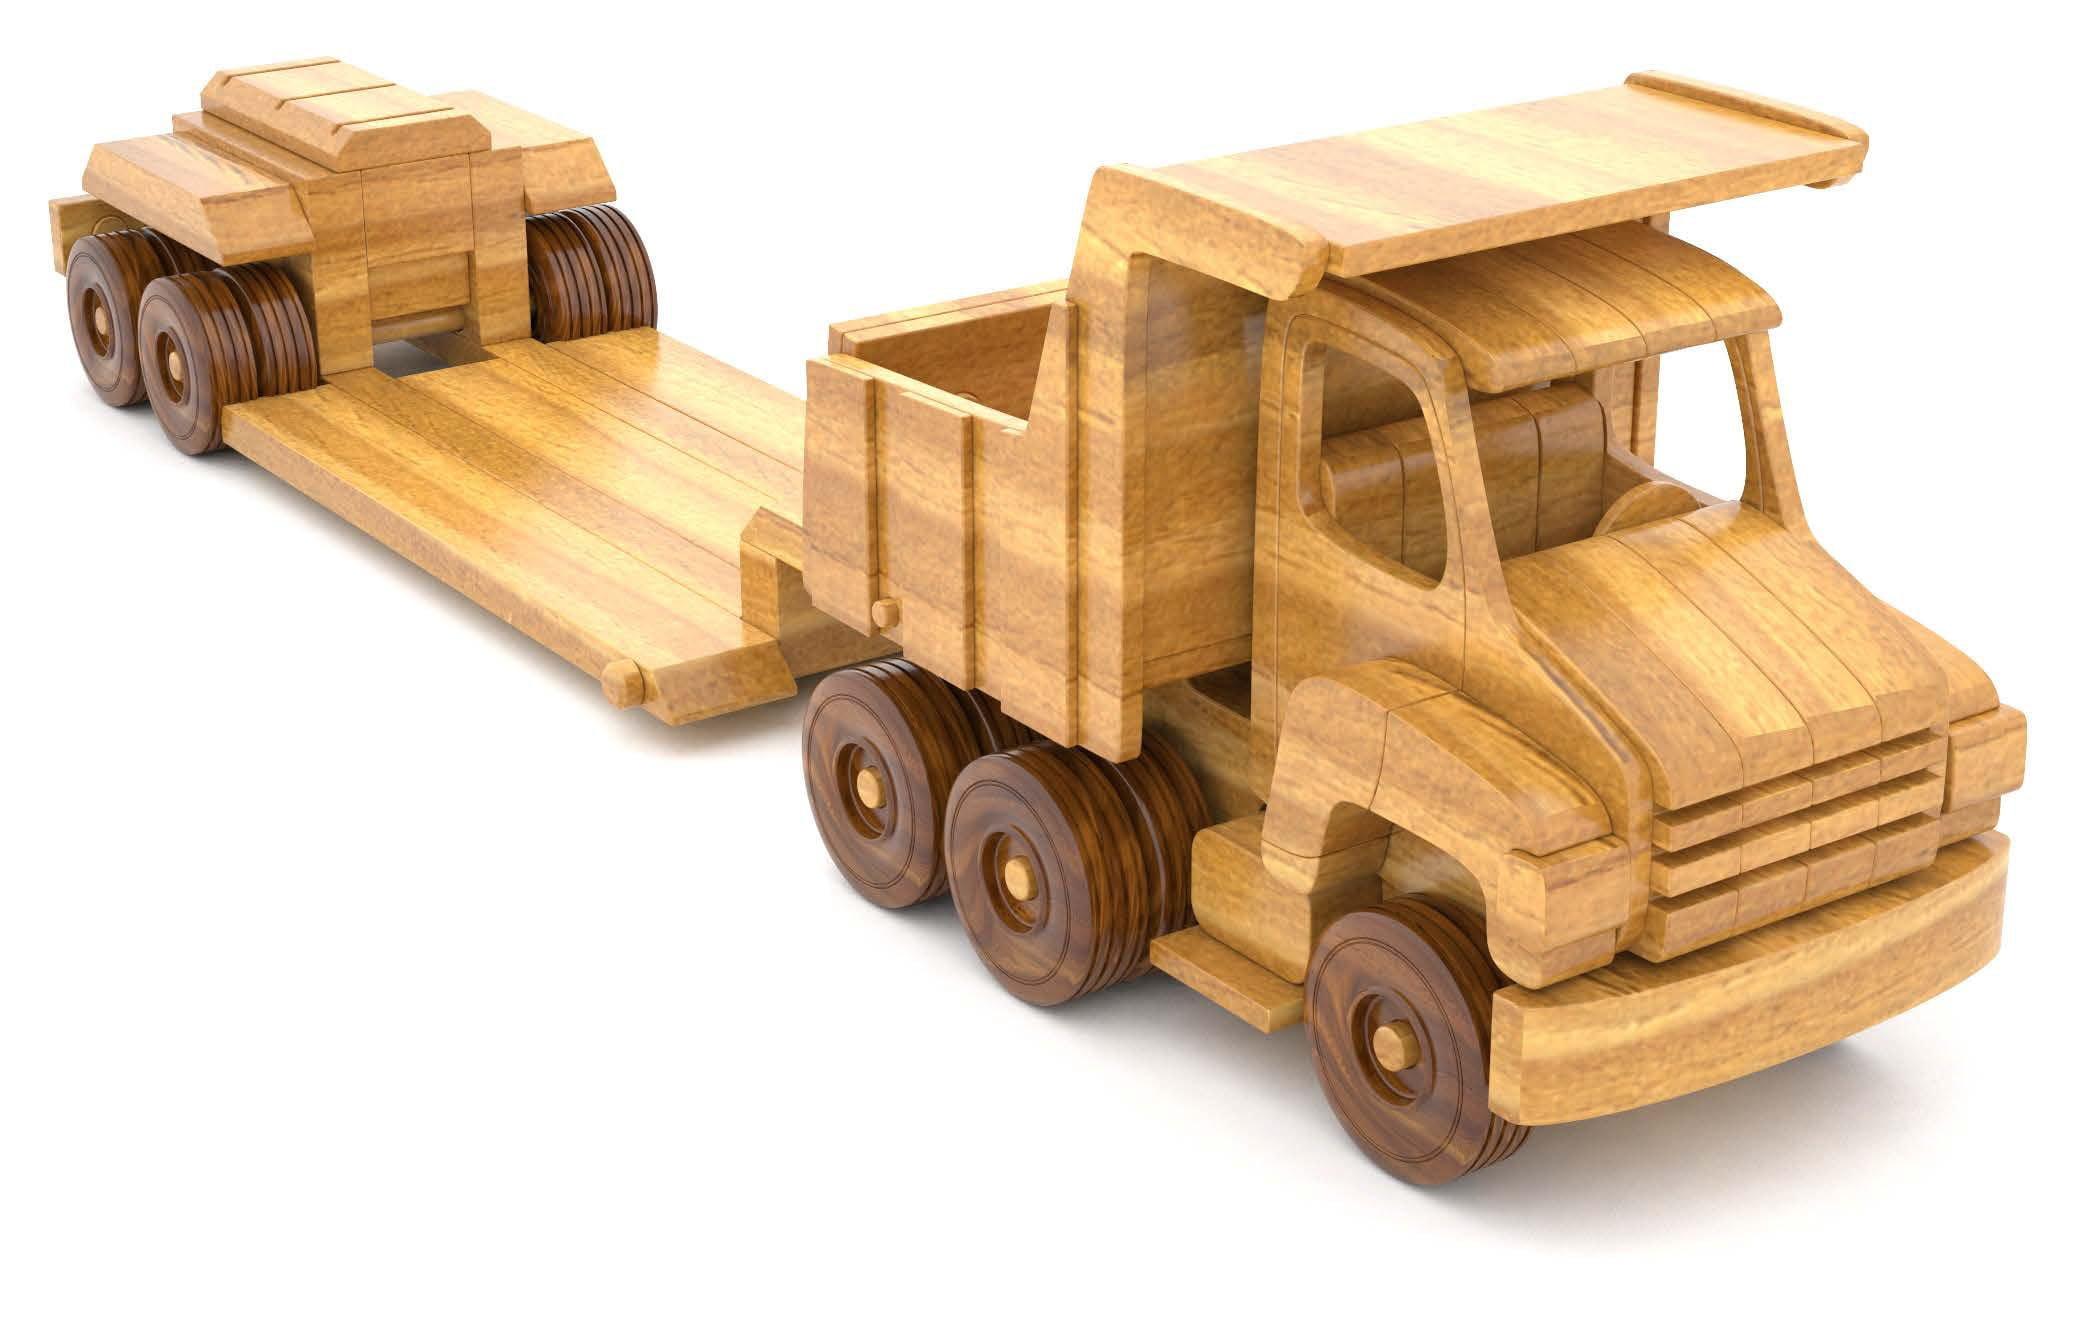 basculanta din lemn - hefty dump truck and lo boy trailer 2 - Basculanta din lemn cu trailer